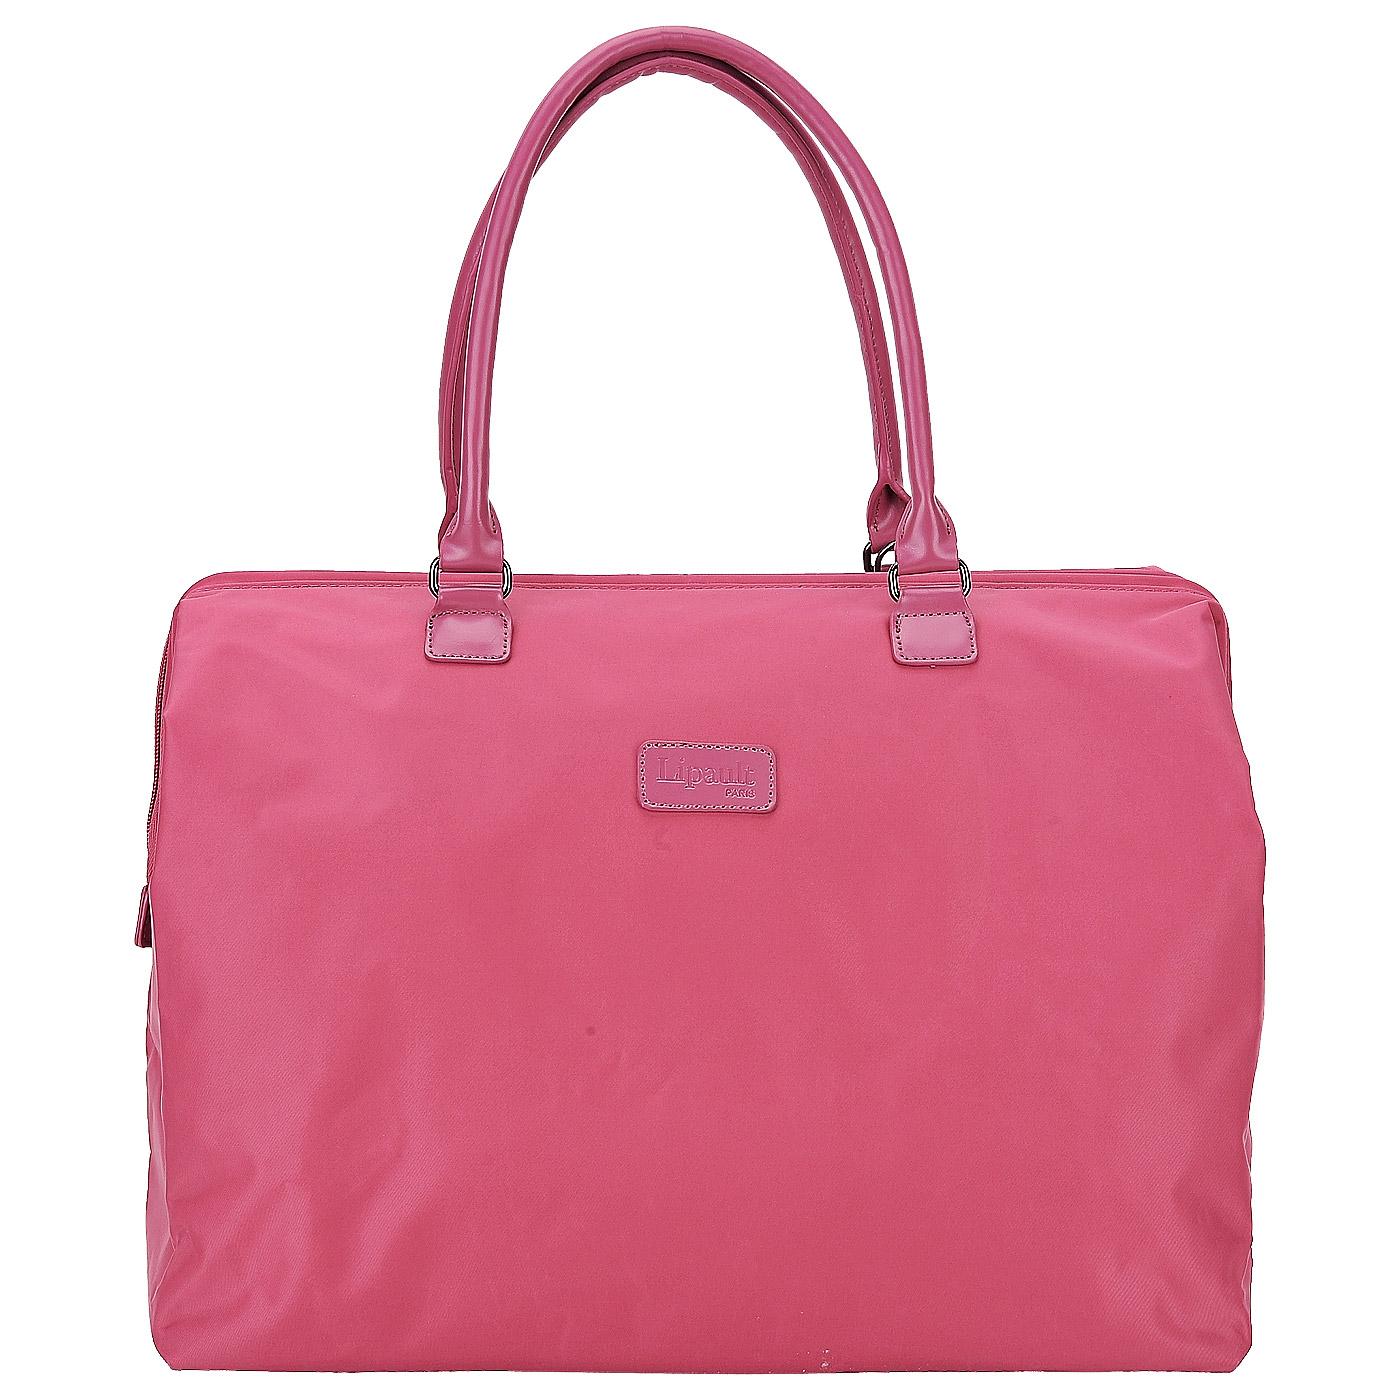 2b332c4ddb55 Женская сумка дорожная Lipault Lady Plume P5190103 - 2000557652767 ...